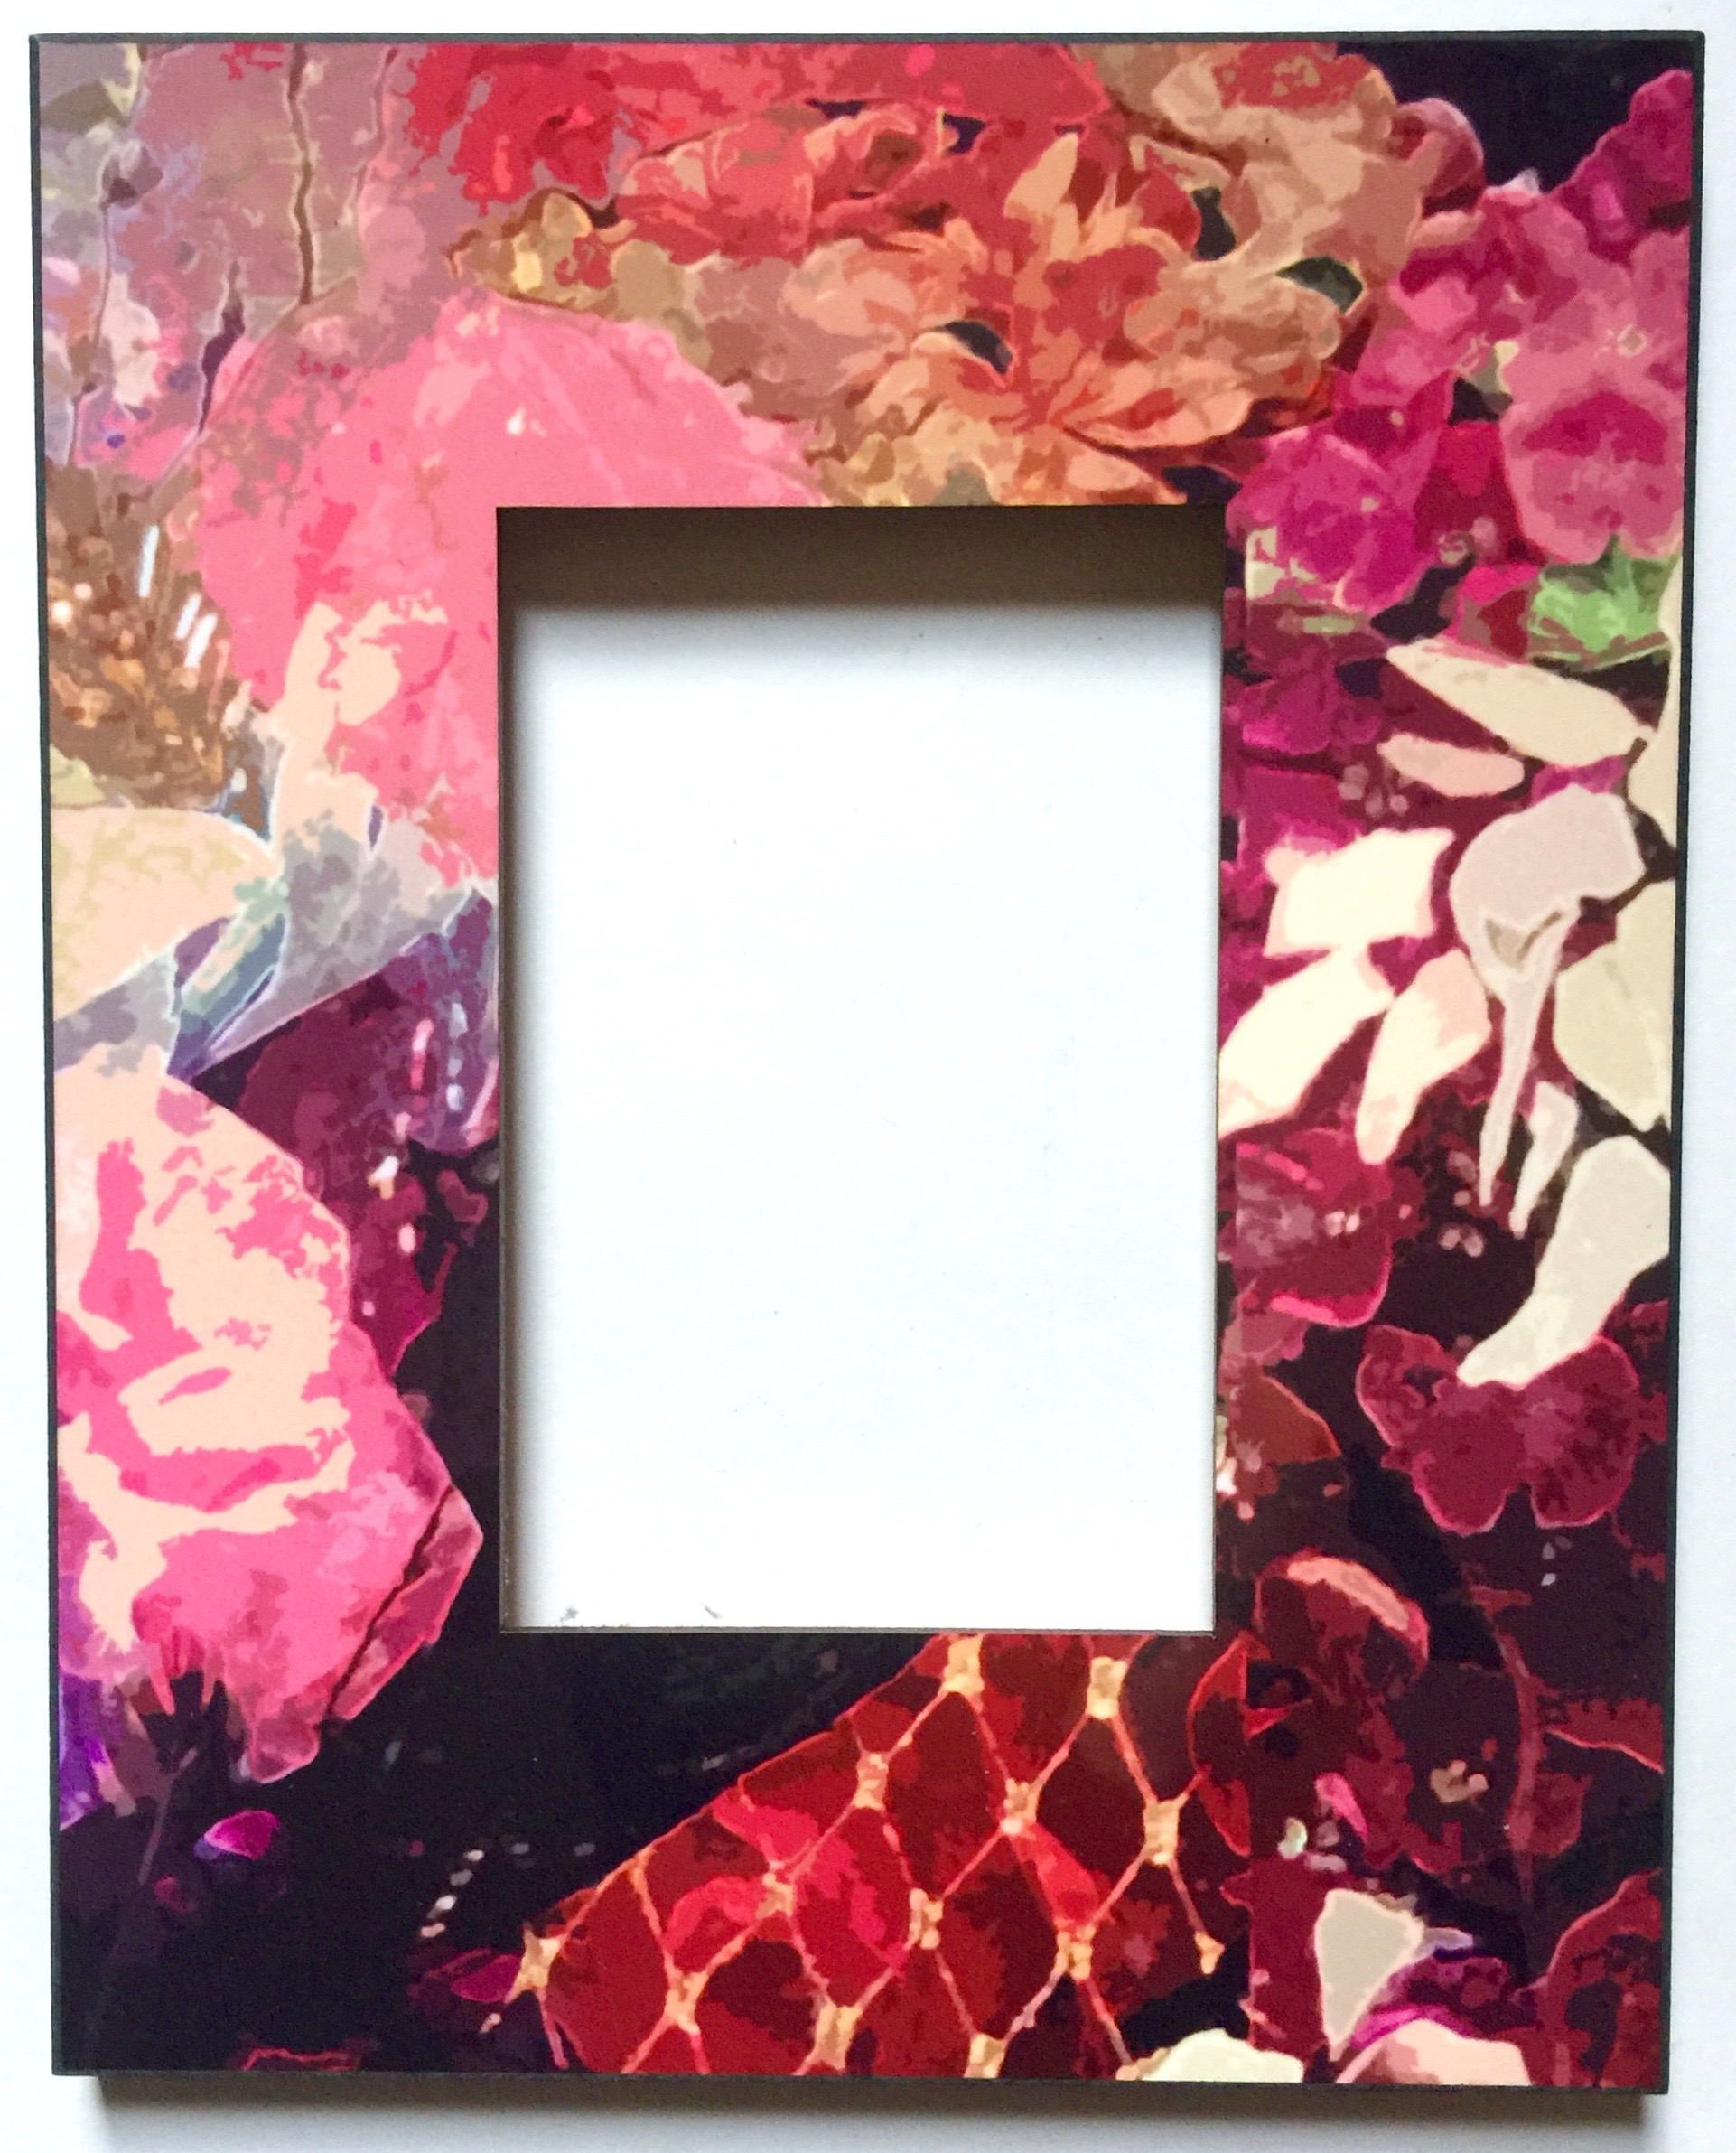 Floral Printed Frame 4x6 $65